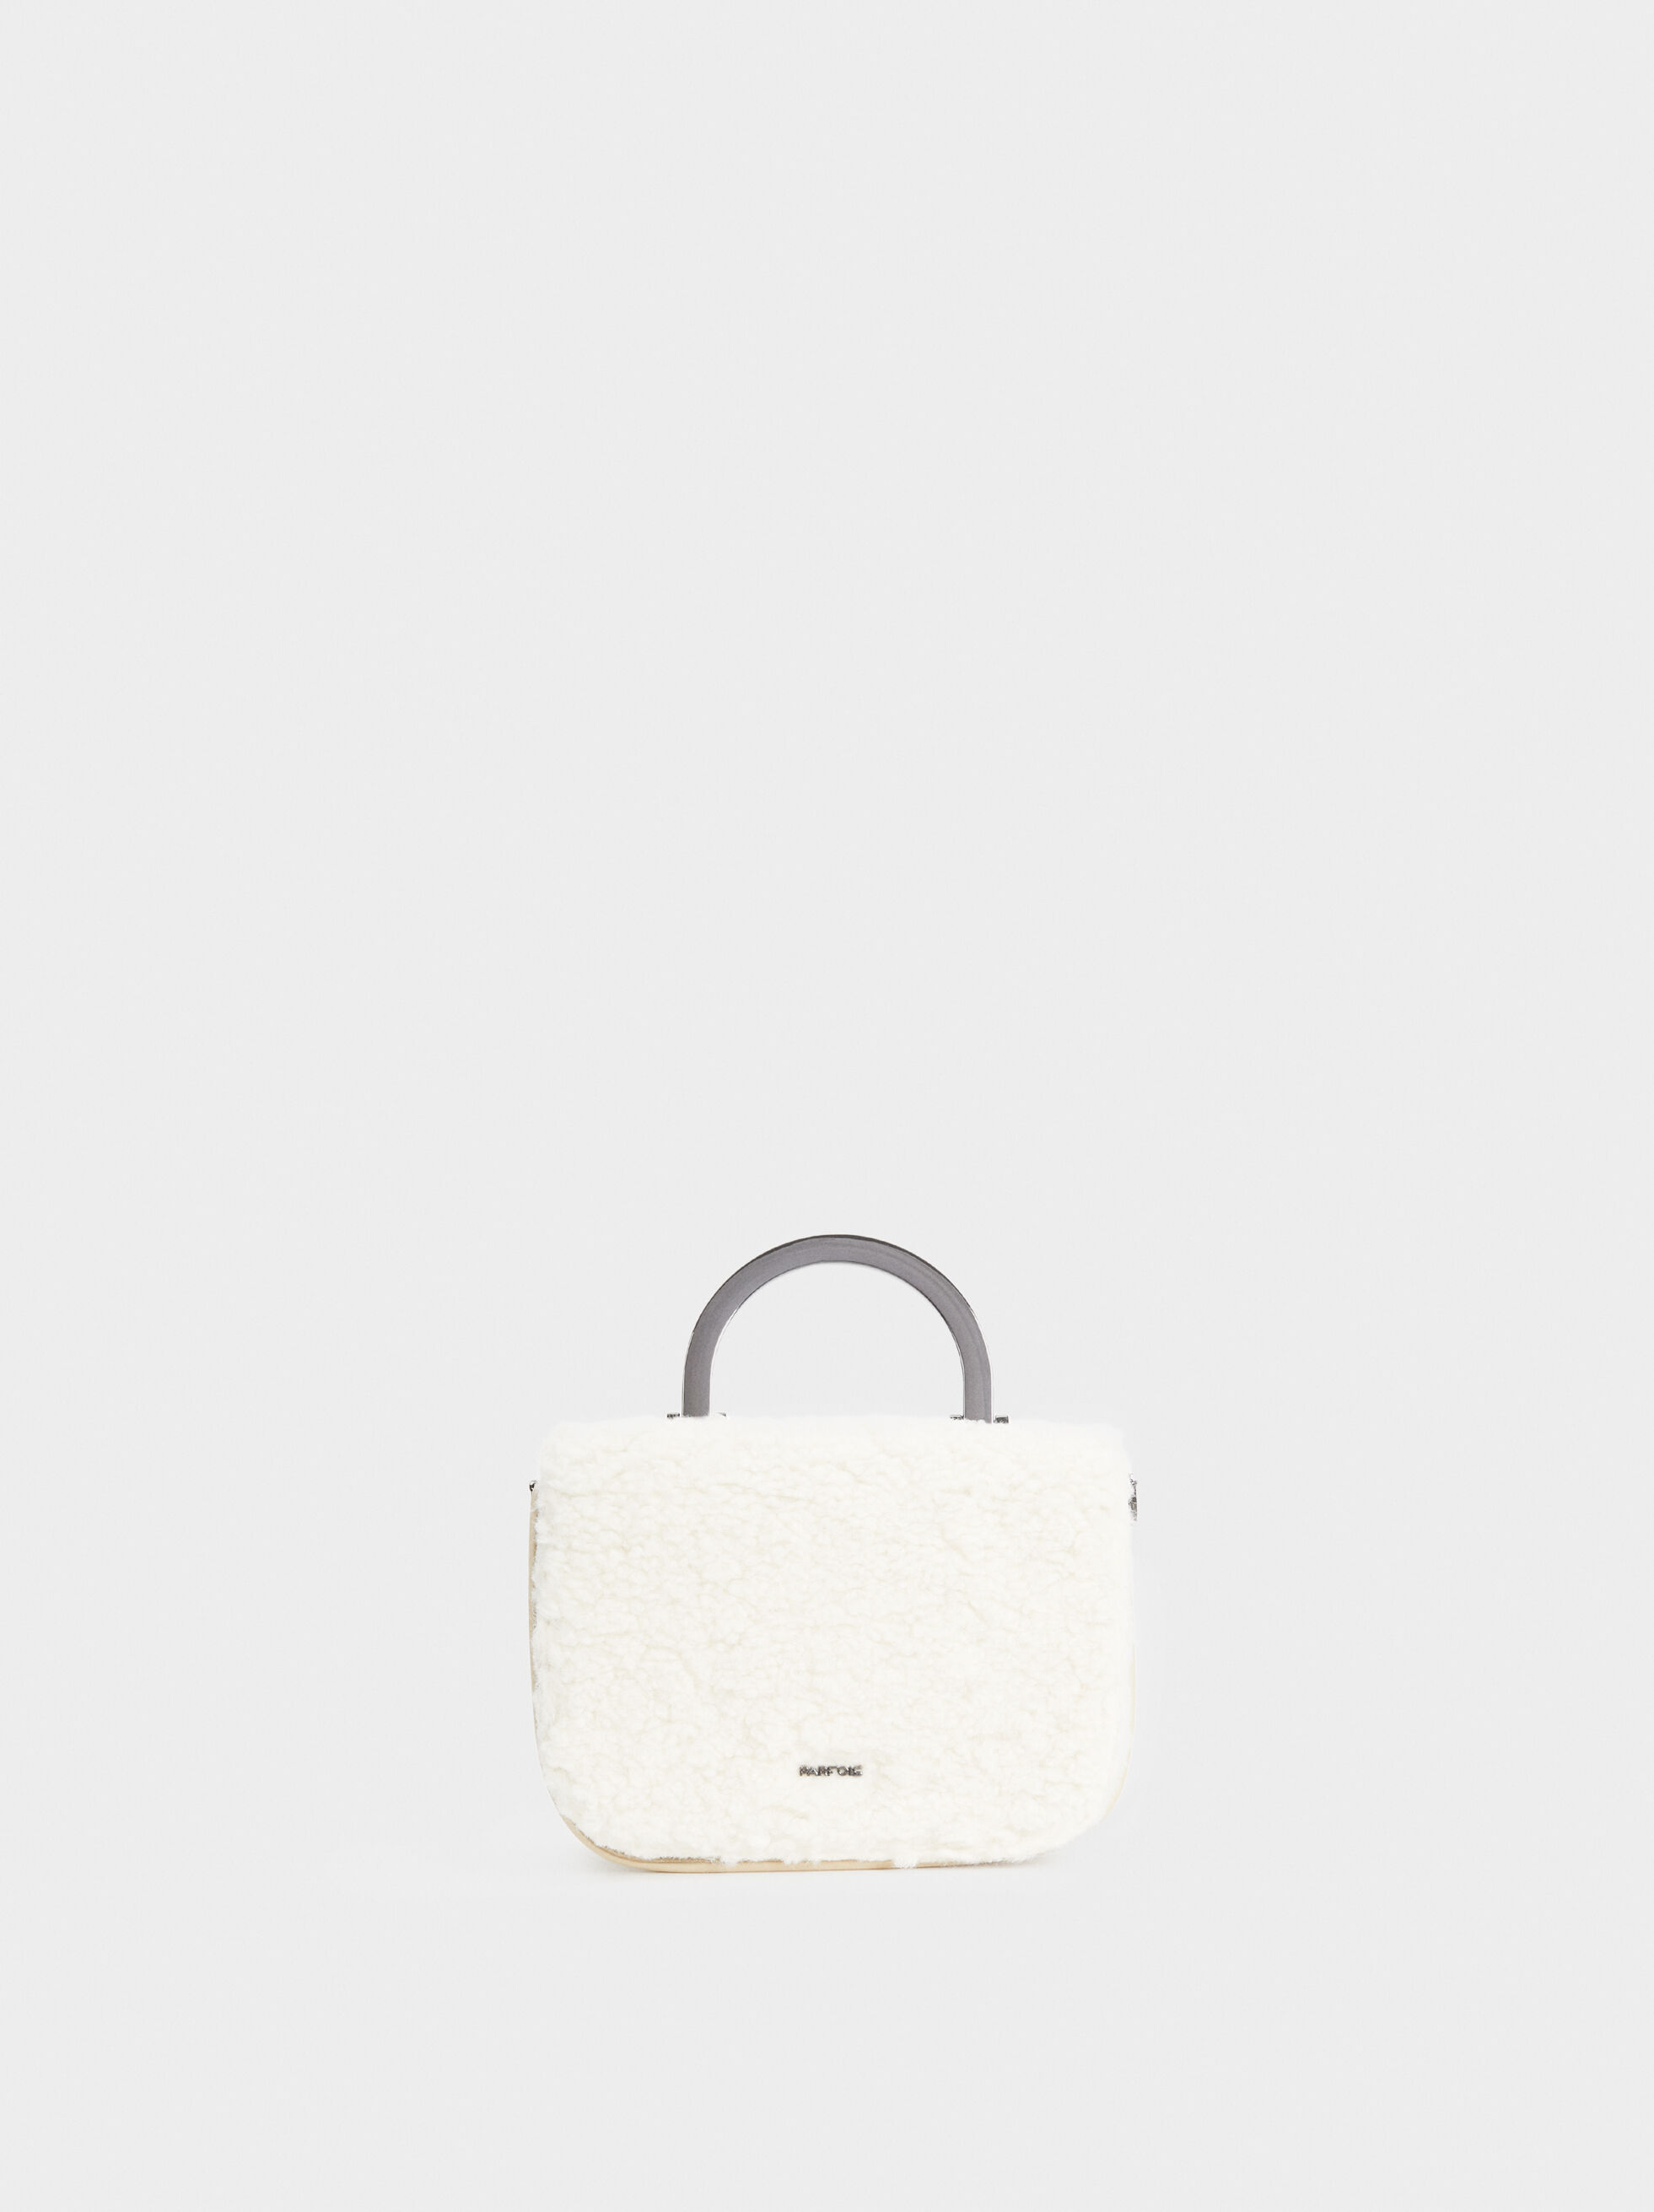 Crossbody Bag With Metallic Handle, White, hi-res